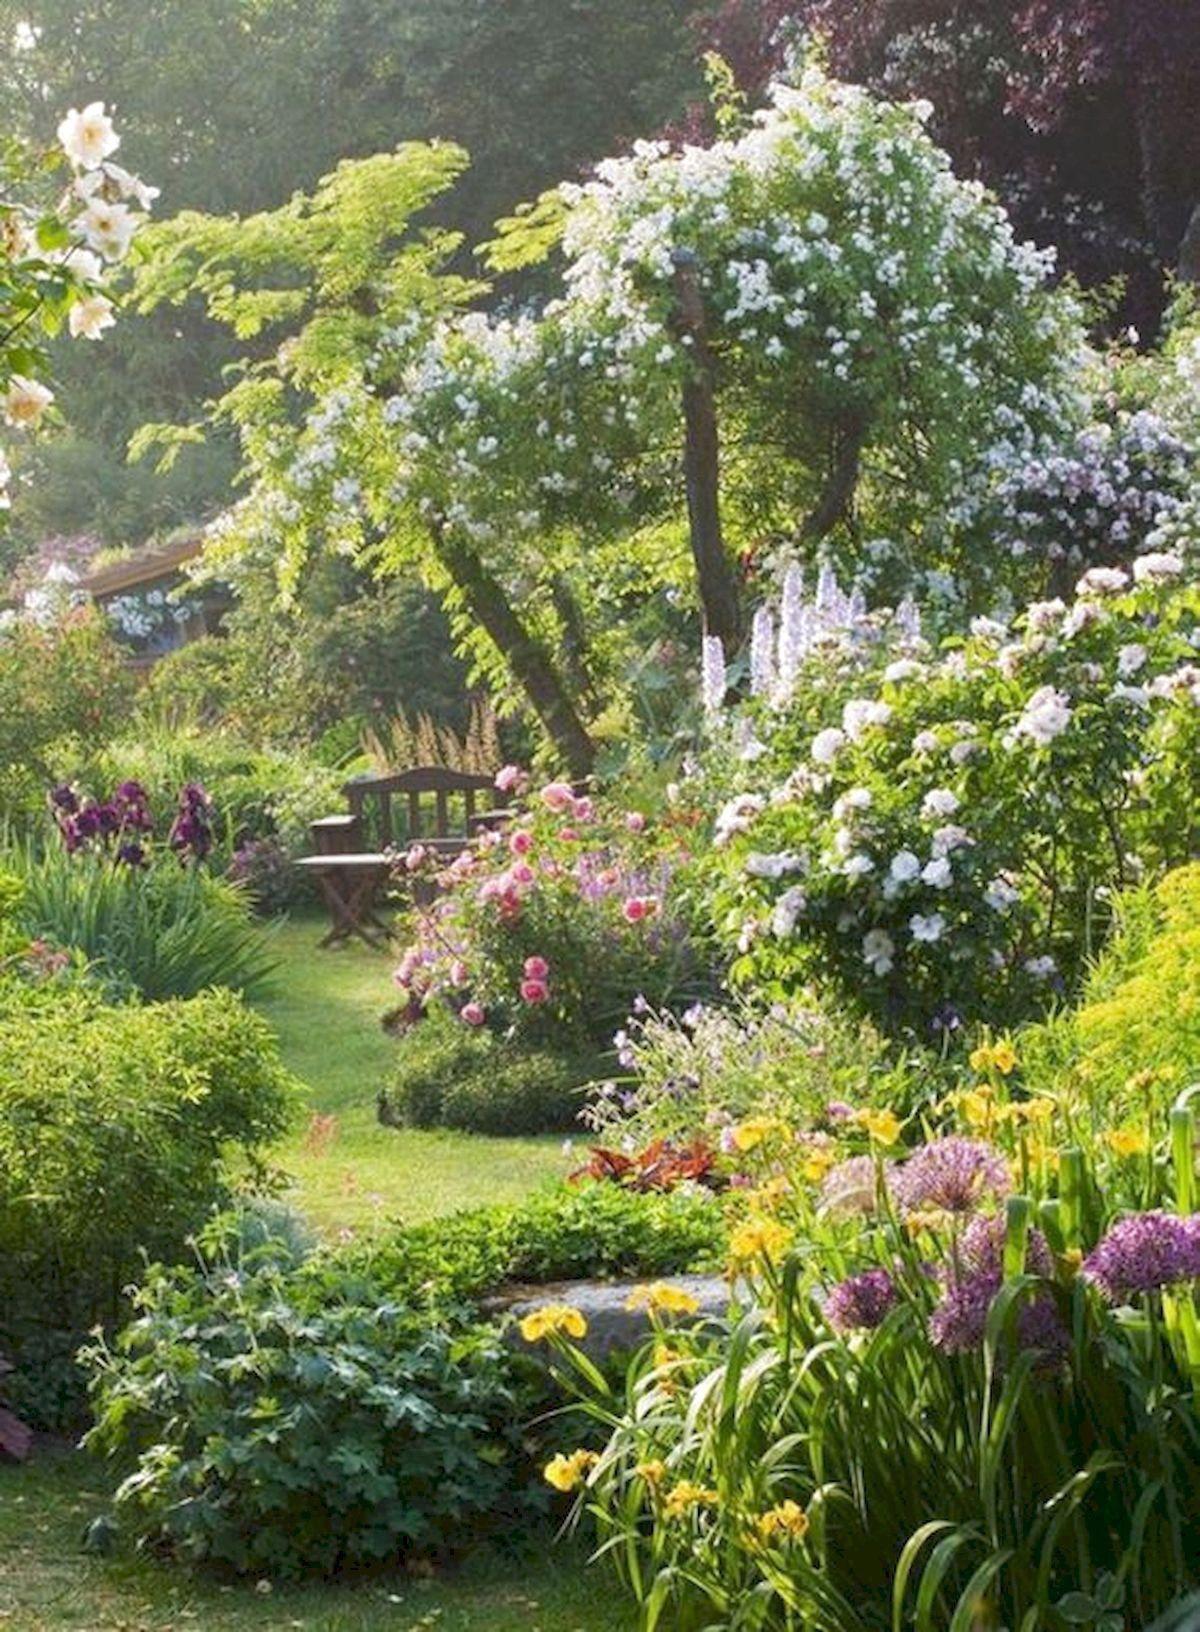 77 Favourite Pinterest Garden Decor Ideas Gardenideas Beautiful Flowers Flower Design Gardens